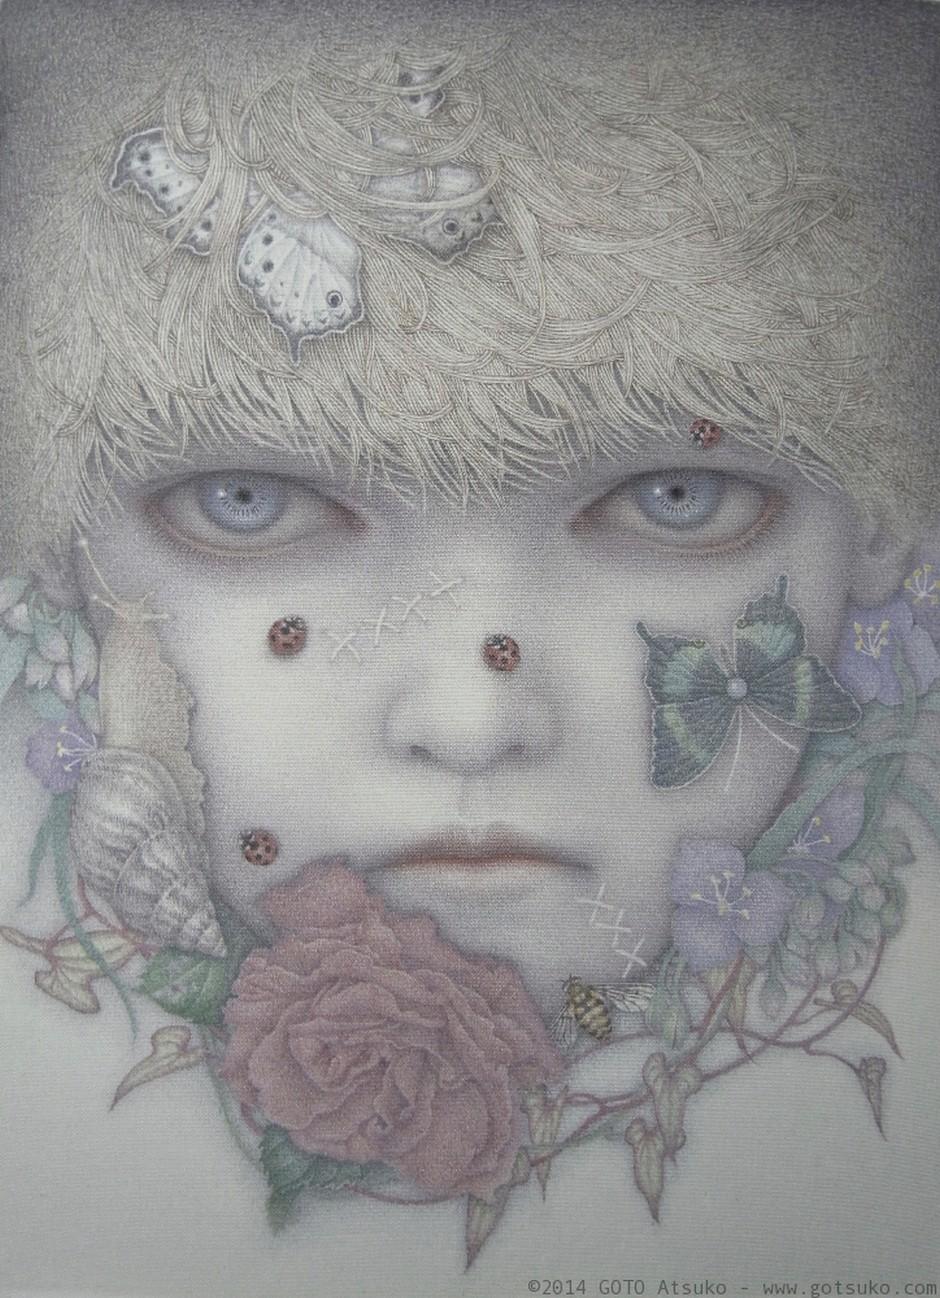 GOTO Atsuko-Drawings-Us